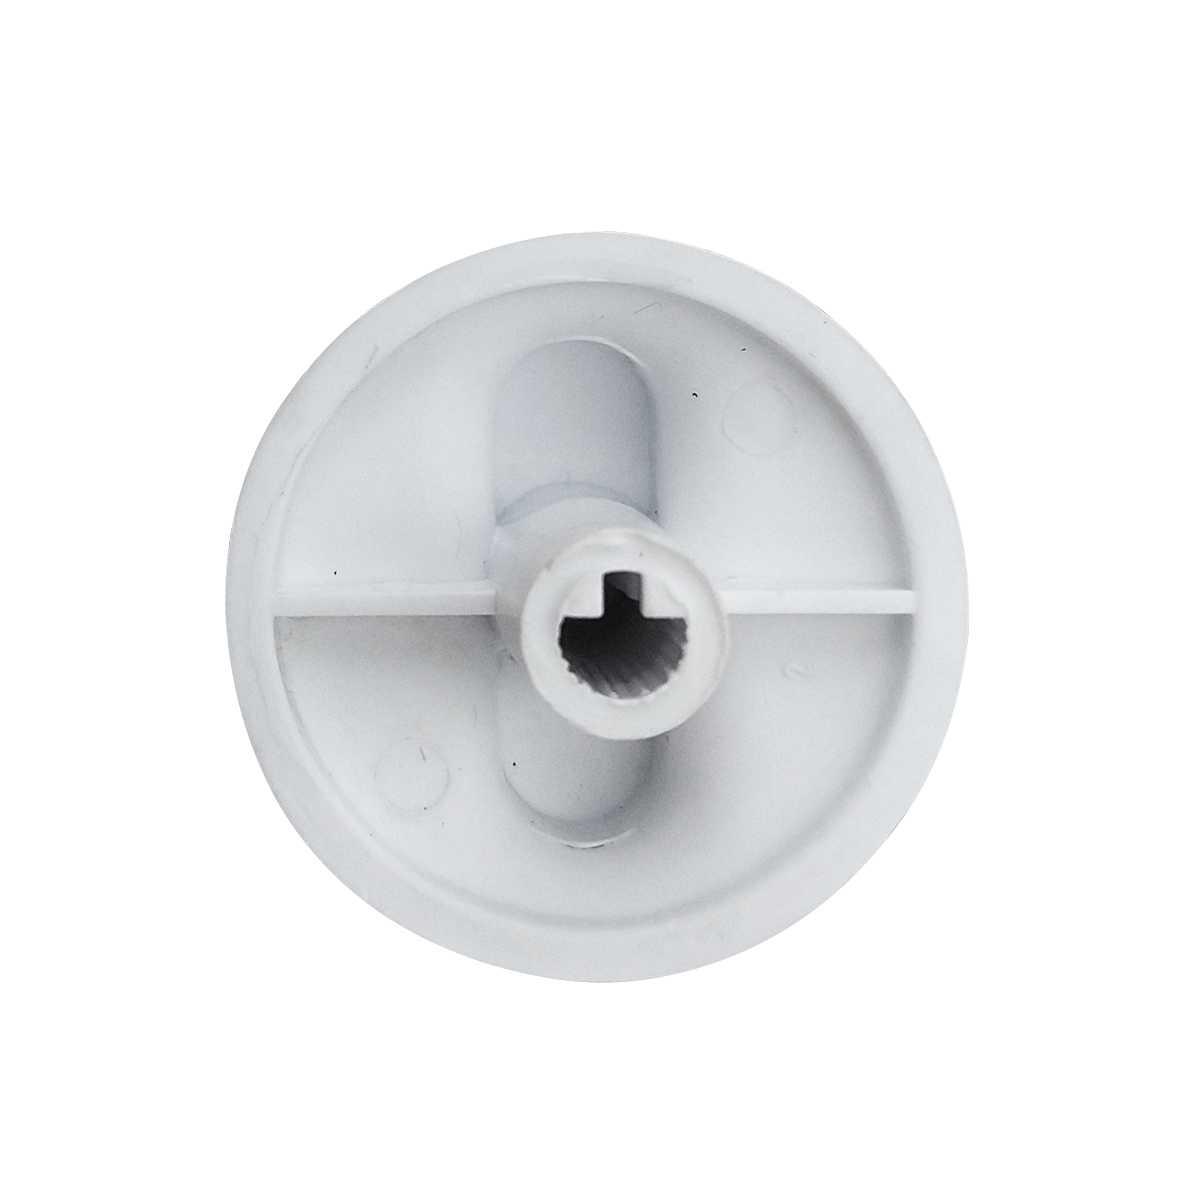 Botão termostato damper geladeira Brastemp